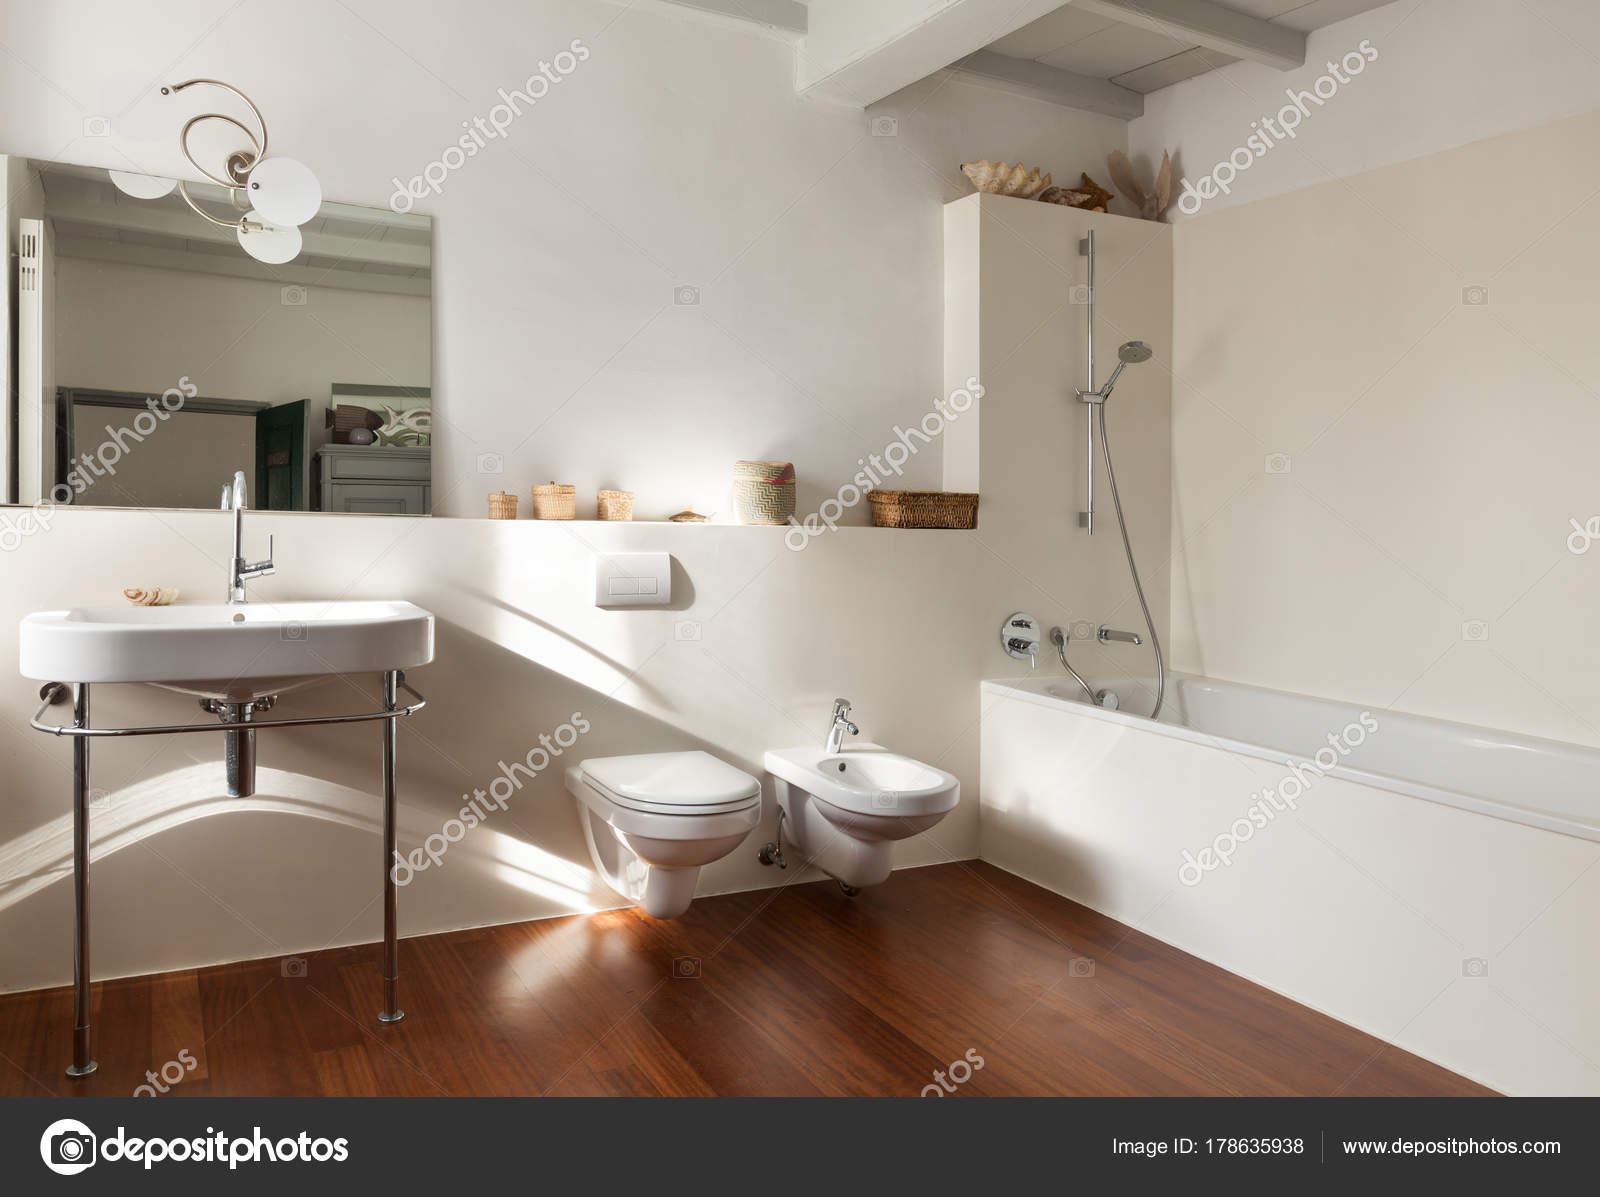 https://st3.depositphotos.com/2018053/17863/i/1600/depositphotos_178635938-stockafbeelding-mooie-loft-badkamer.jpg